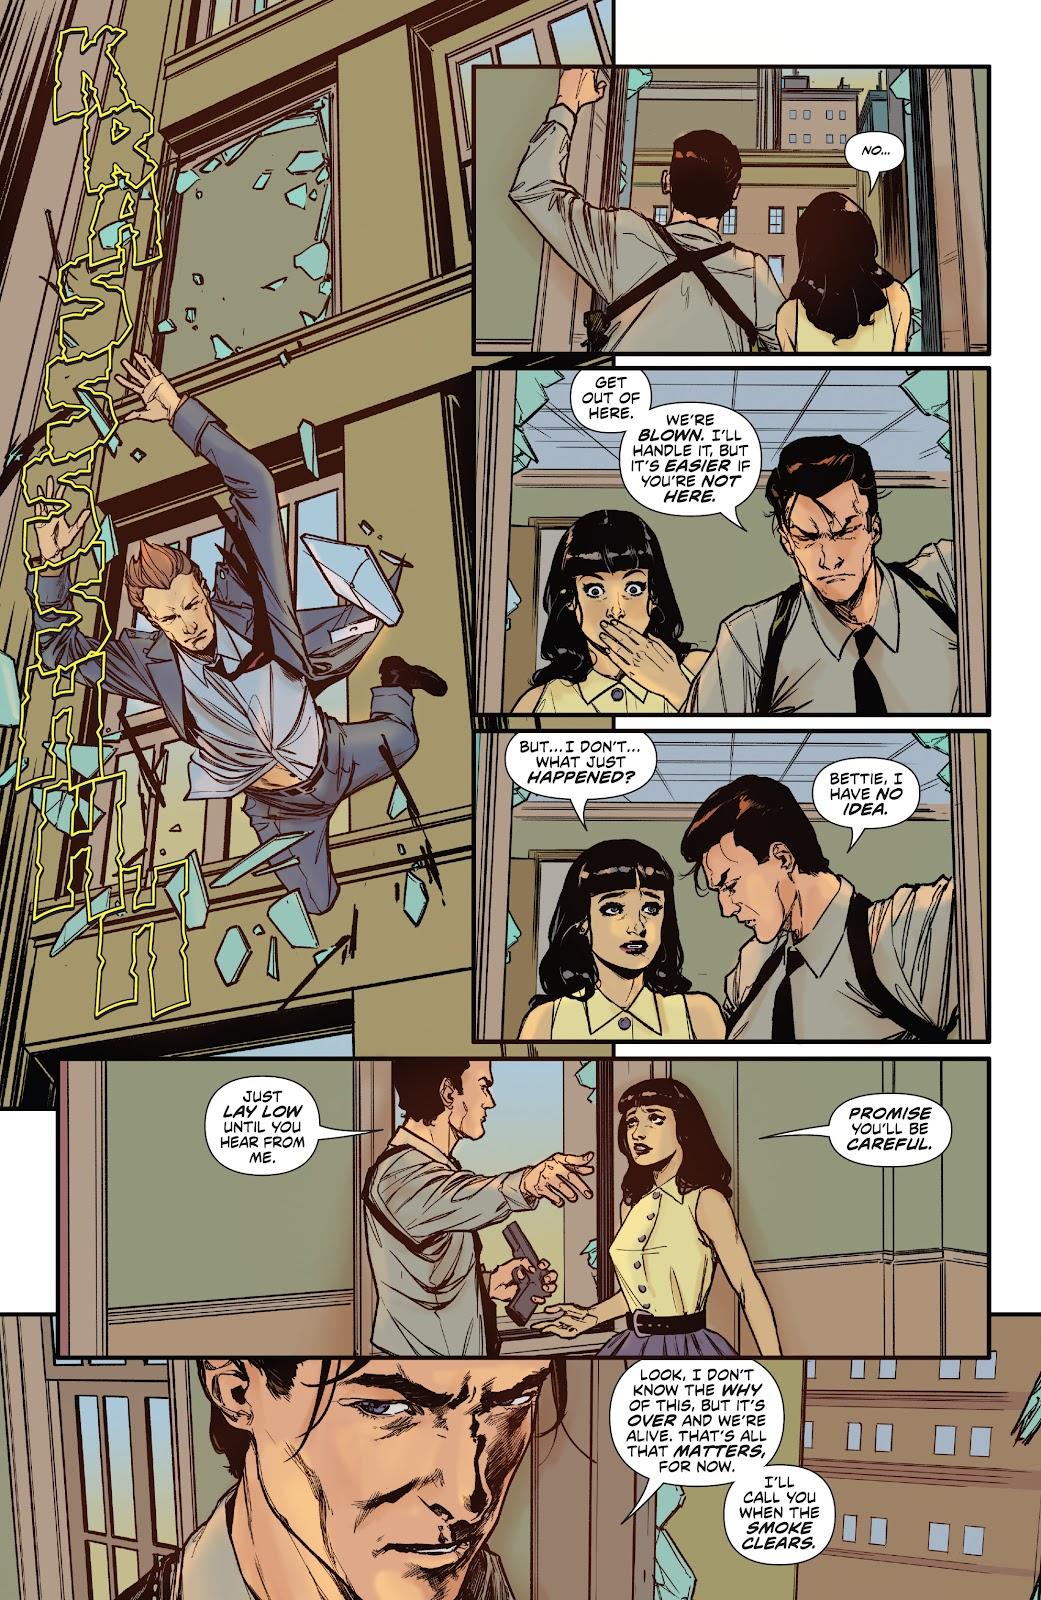 Read online Bettie Page: Unbound comic -  Issue #6 - 10